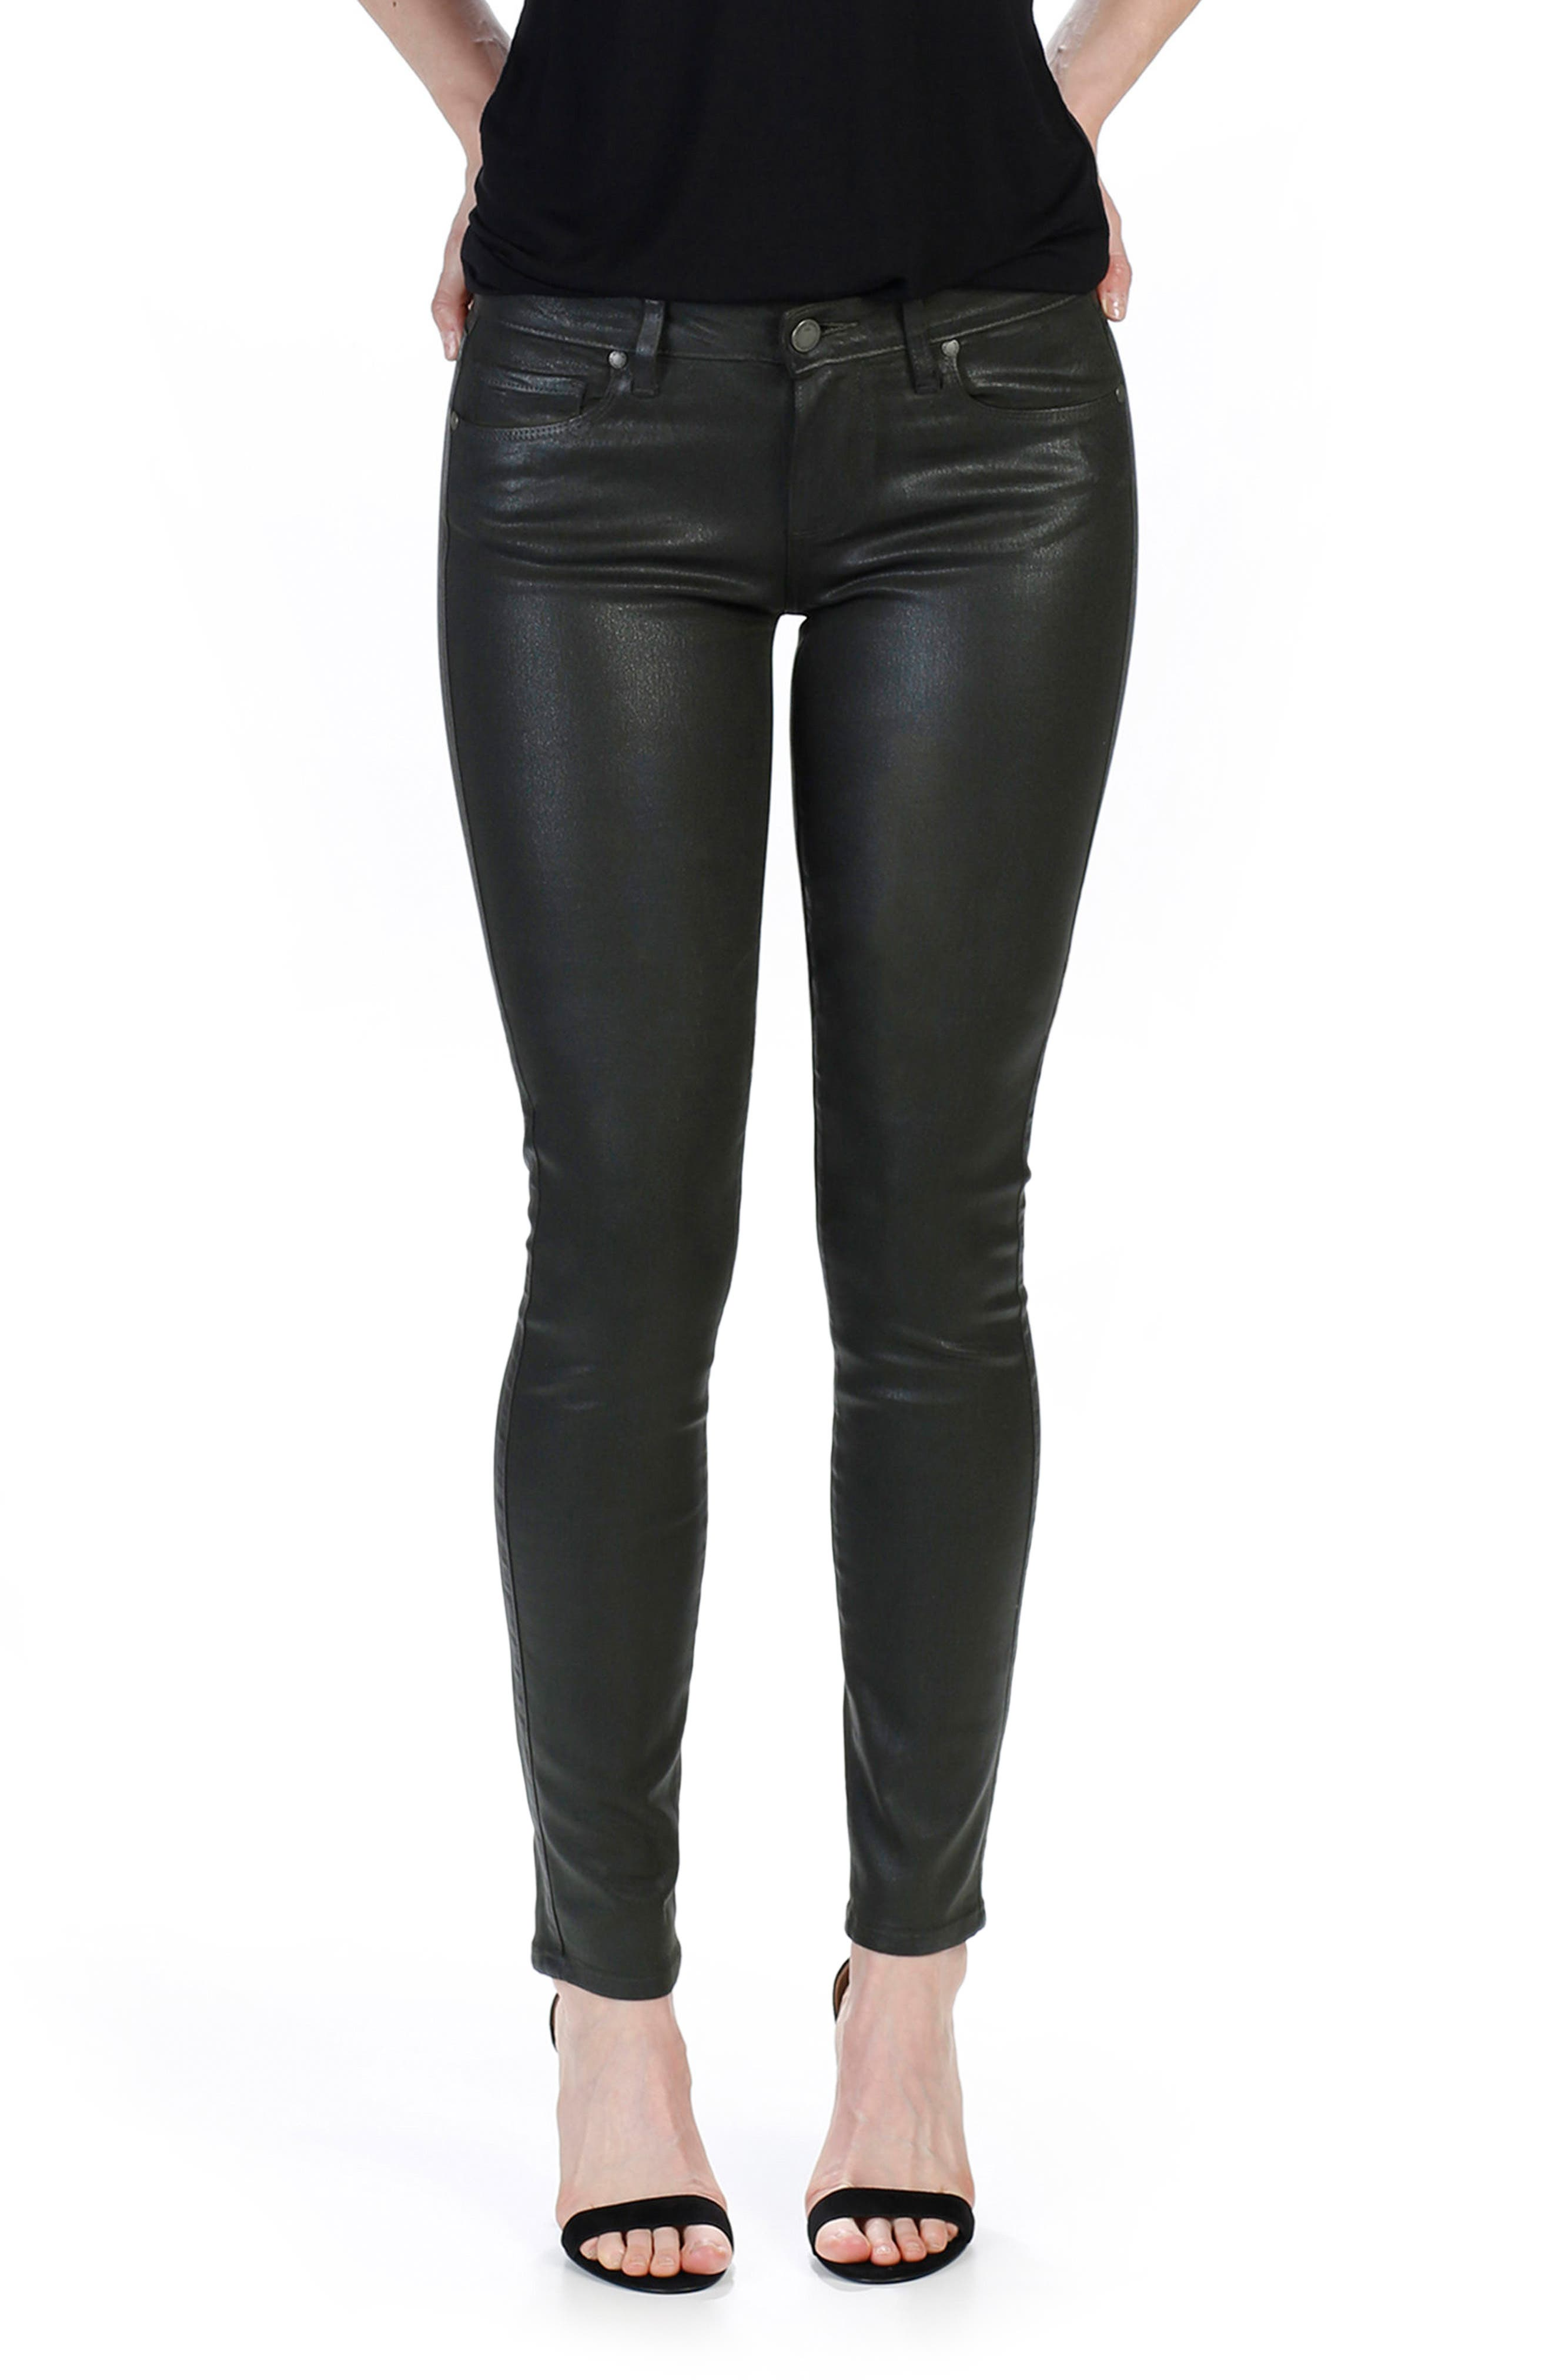 PAIGE Transcend - Verdugo Coated Skinny Jeans (Deep Juniper Luxe)